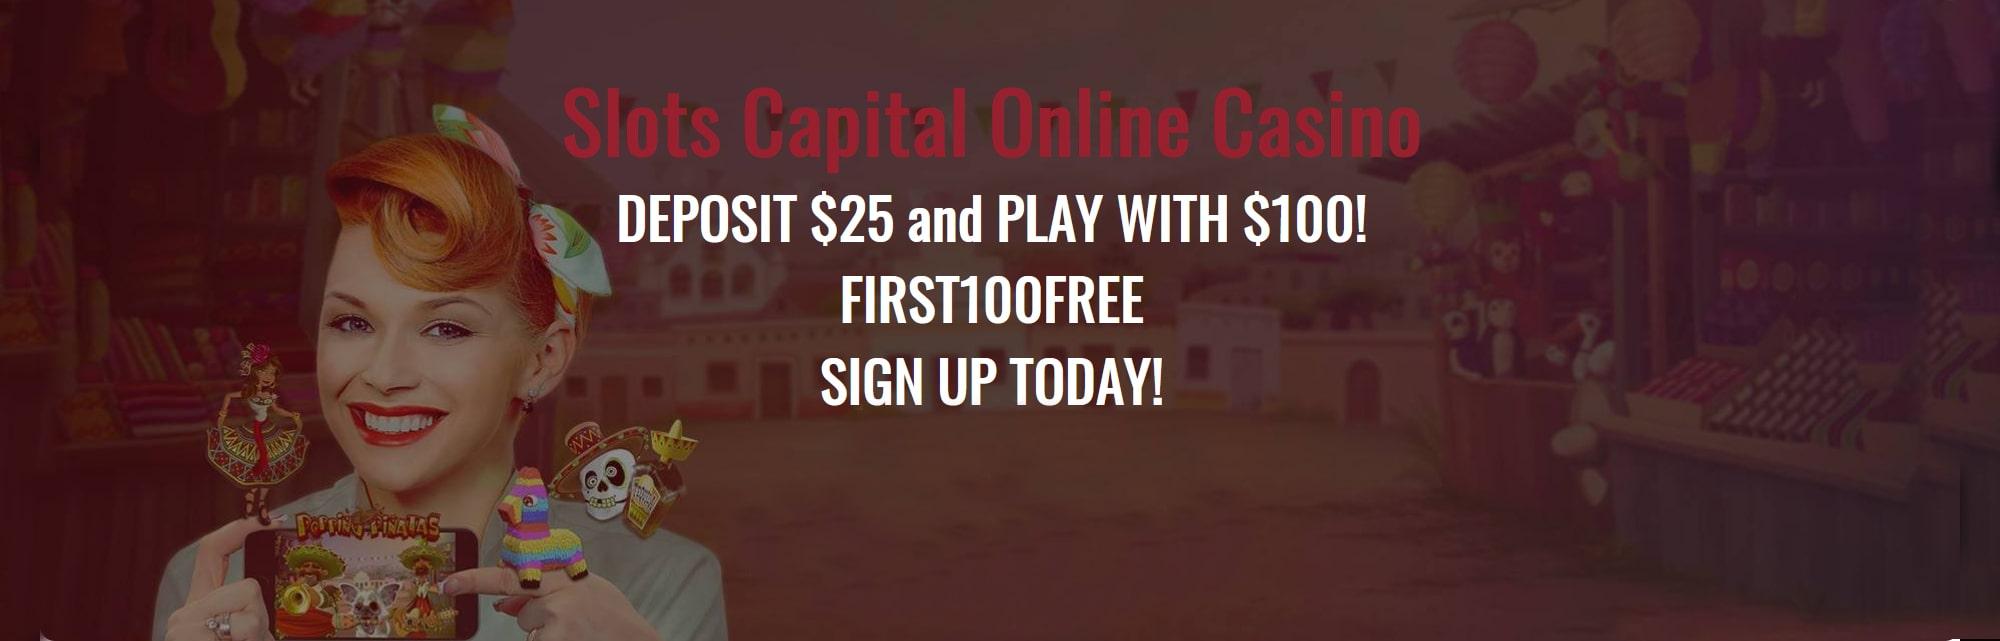 Slots Capital casino bonus $100.